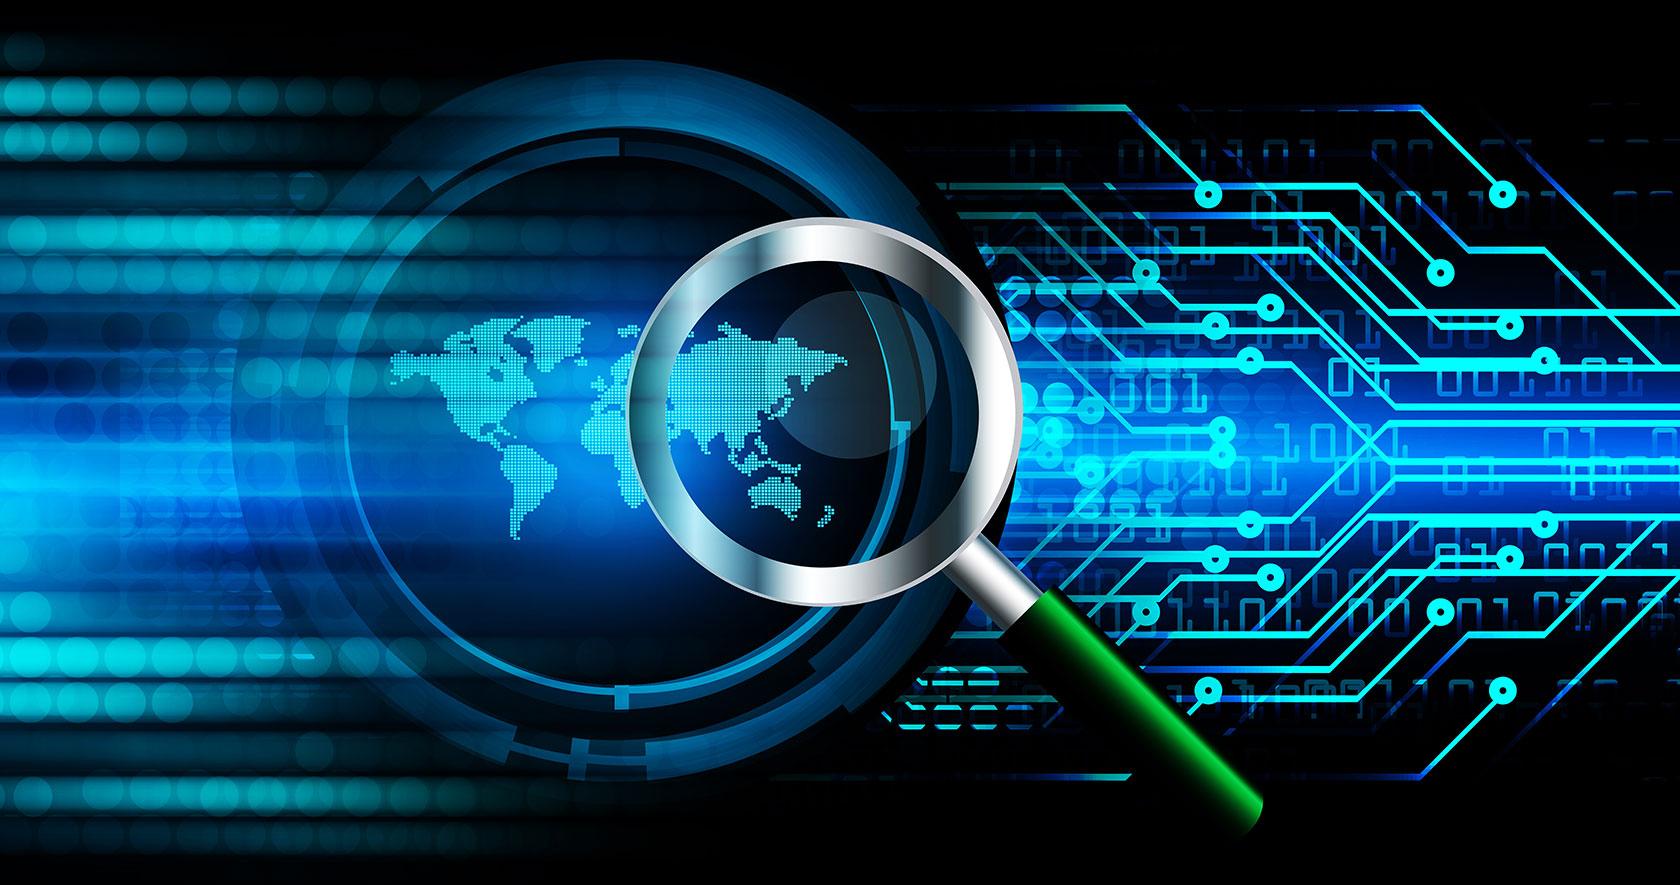 Enterprise Search Market Worldwide Share & Recent Demand 2026 by Top Companies IBM Corp, SAP AG, Oracle, Microsoft, Google, HP Autonomy